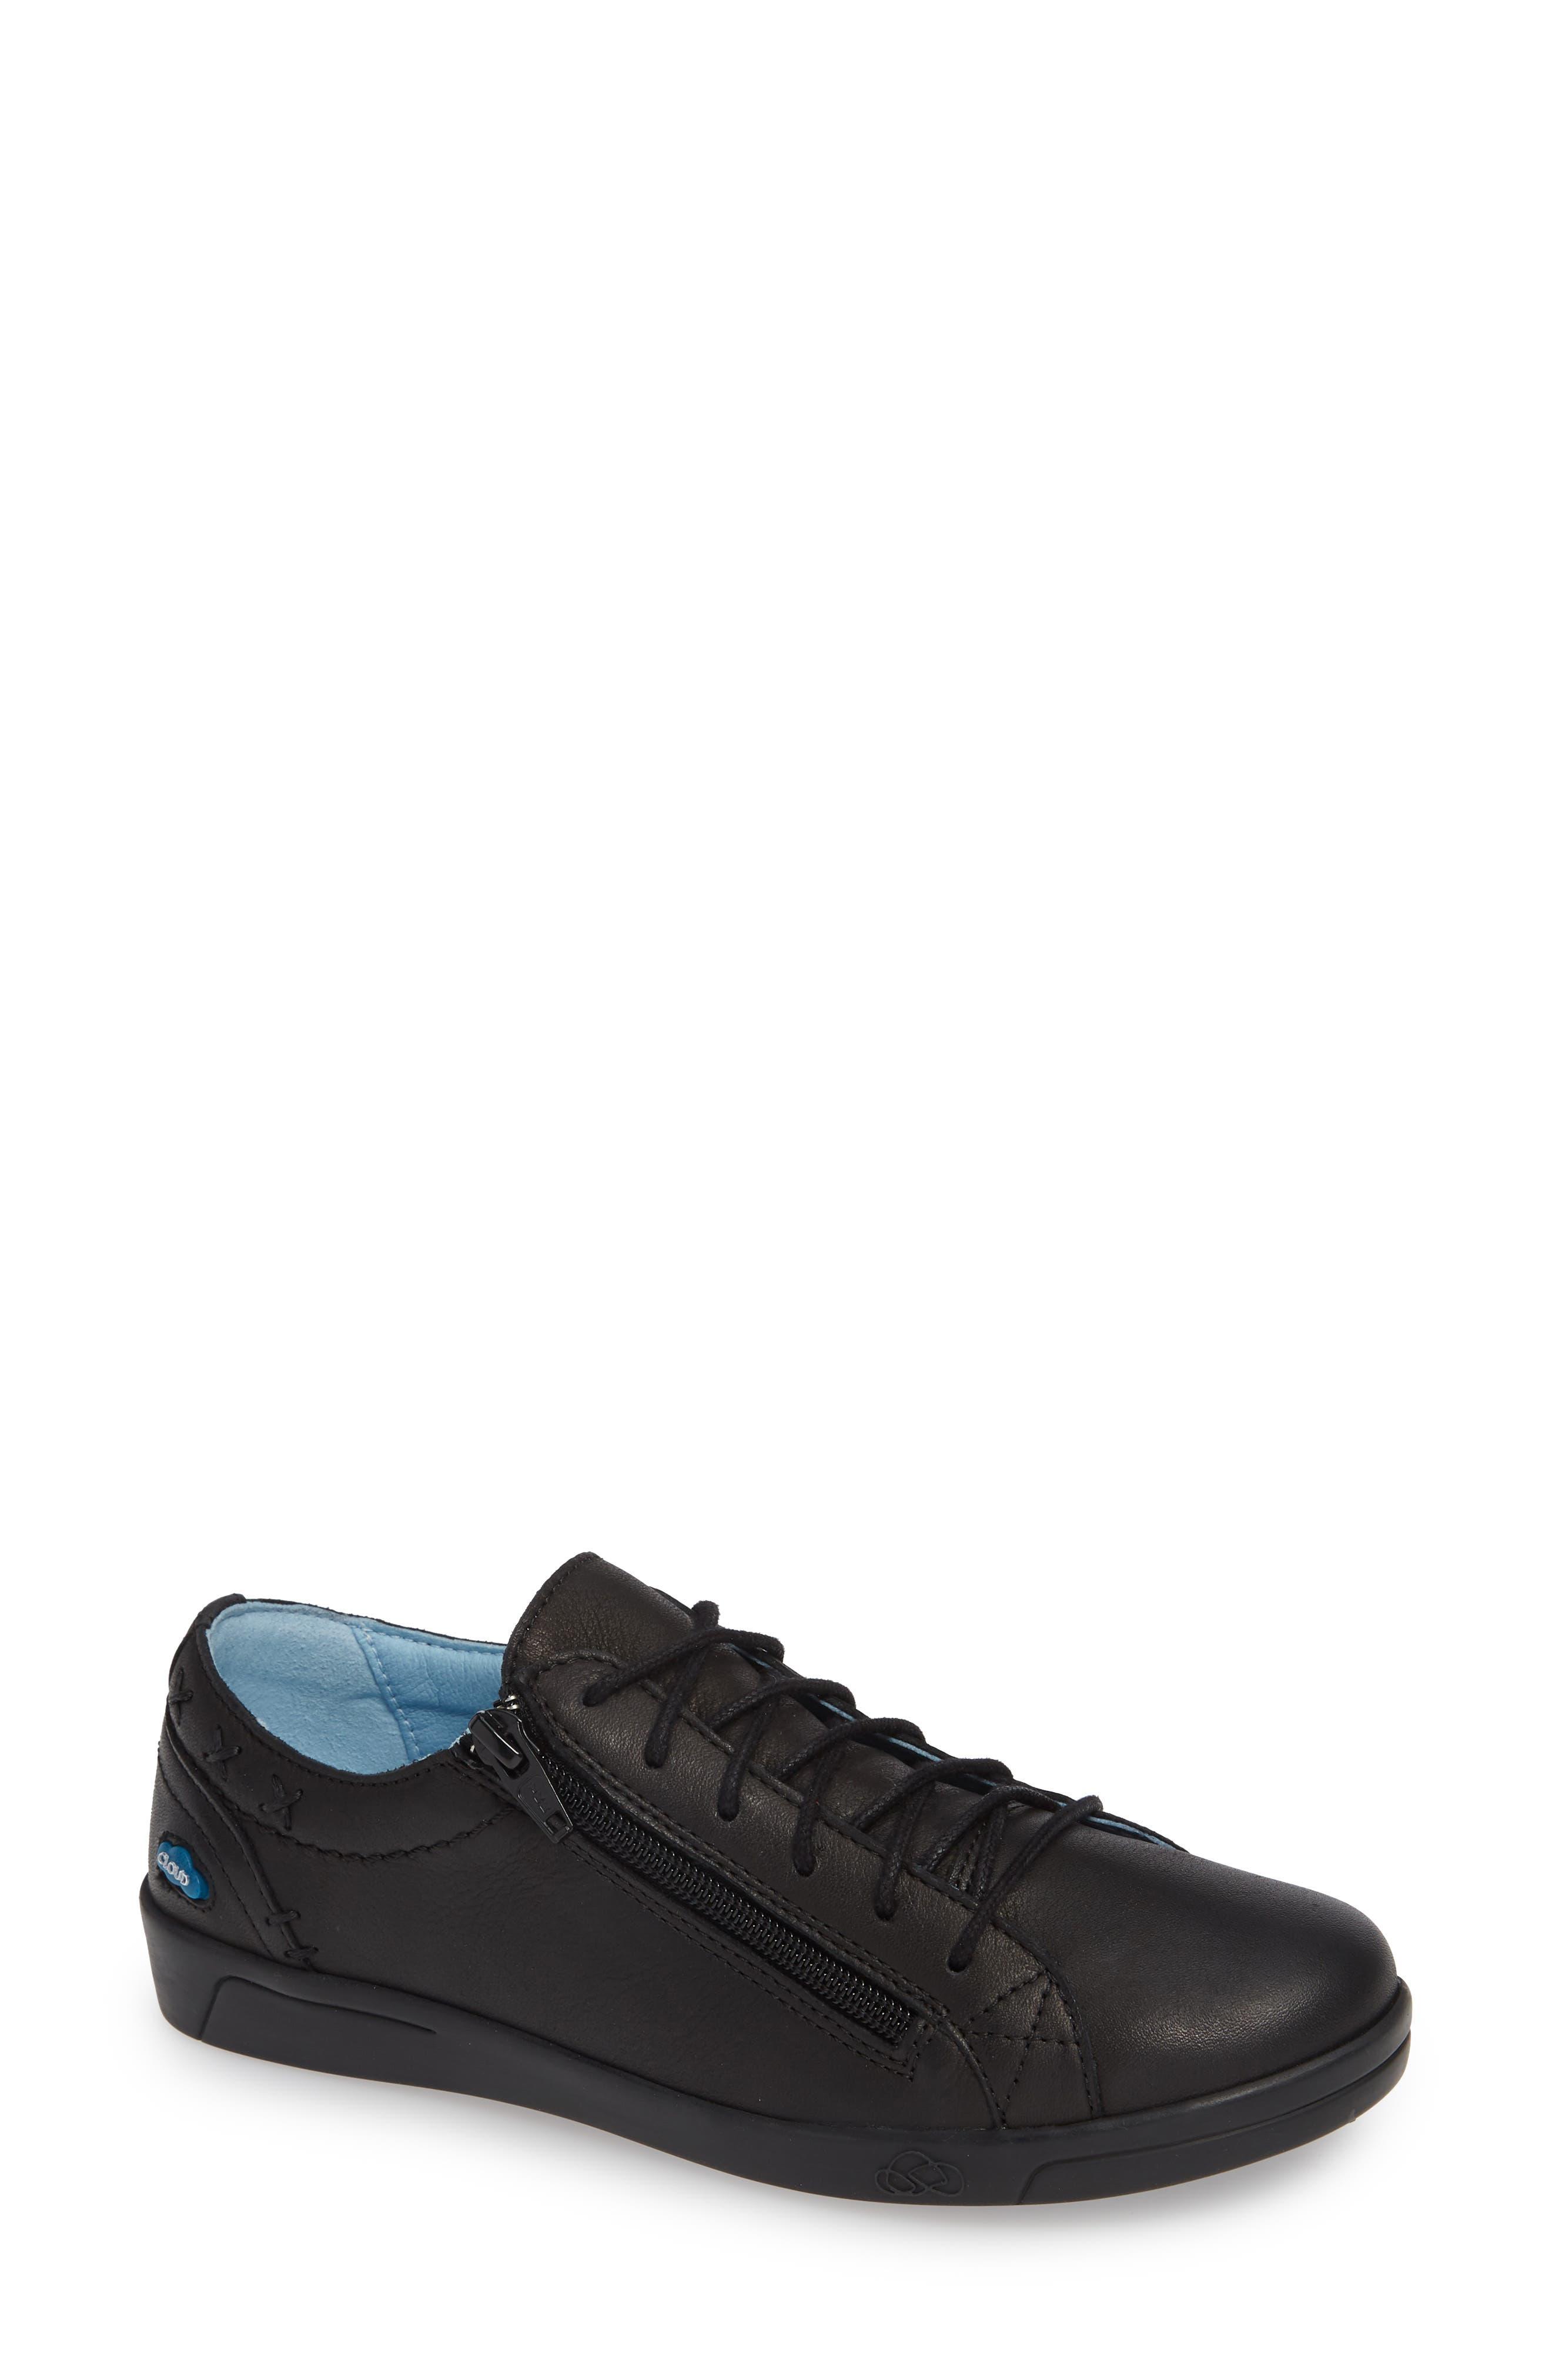 CLOUD 'Aika' Leather Sneaker, Main, color, 004